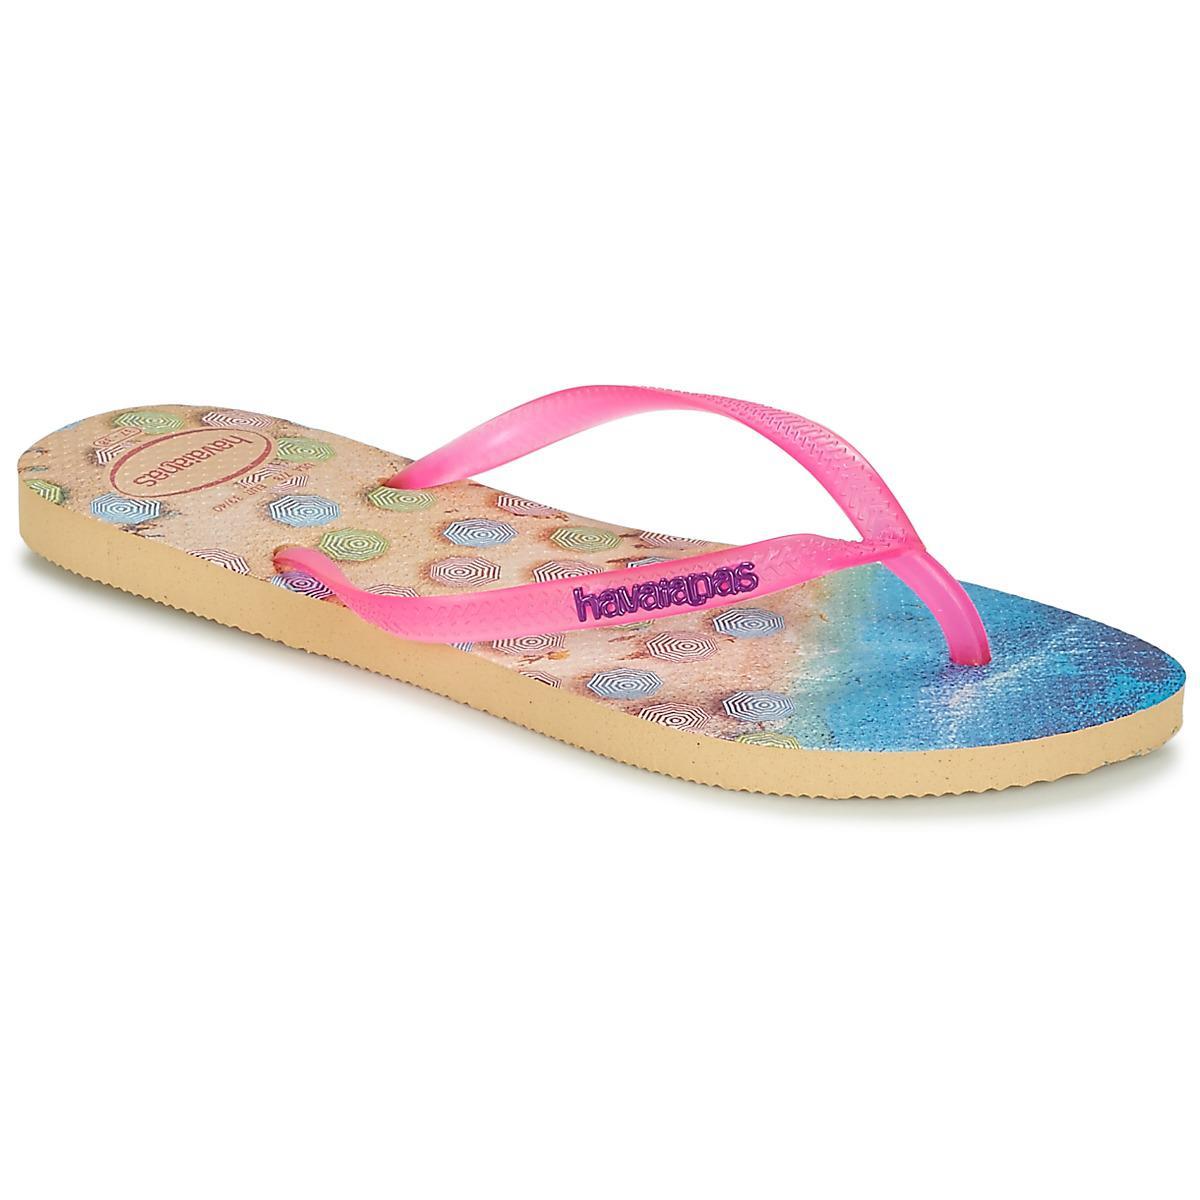 fdacb92855d5 Havaianas Slim Paisage Women s Flip Flops   Sandals (shoes) In ...